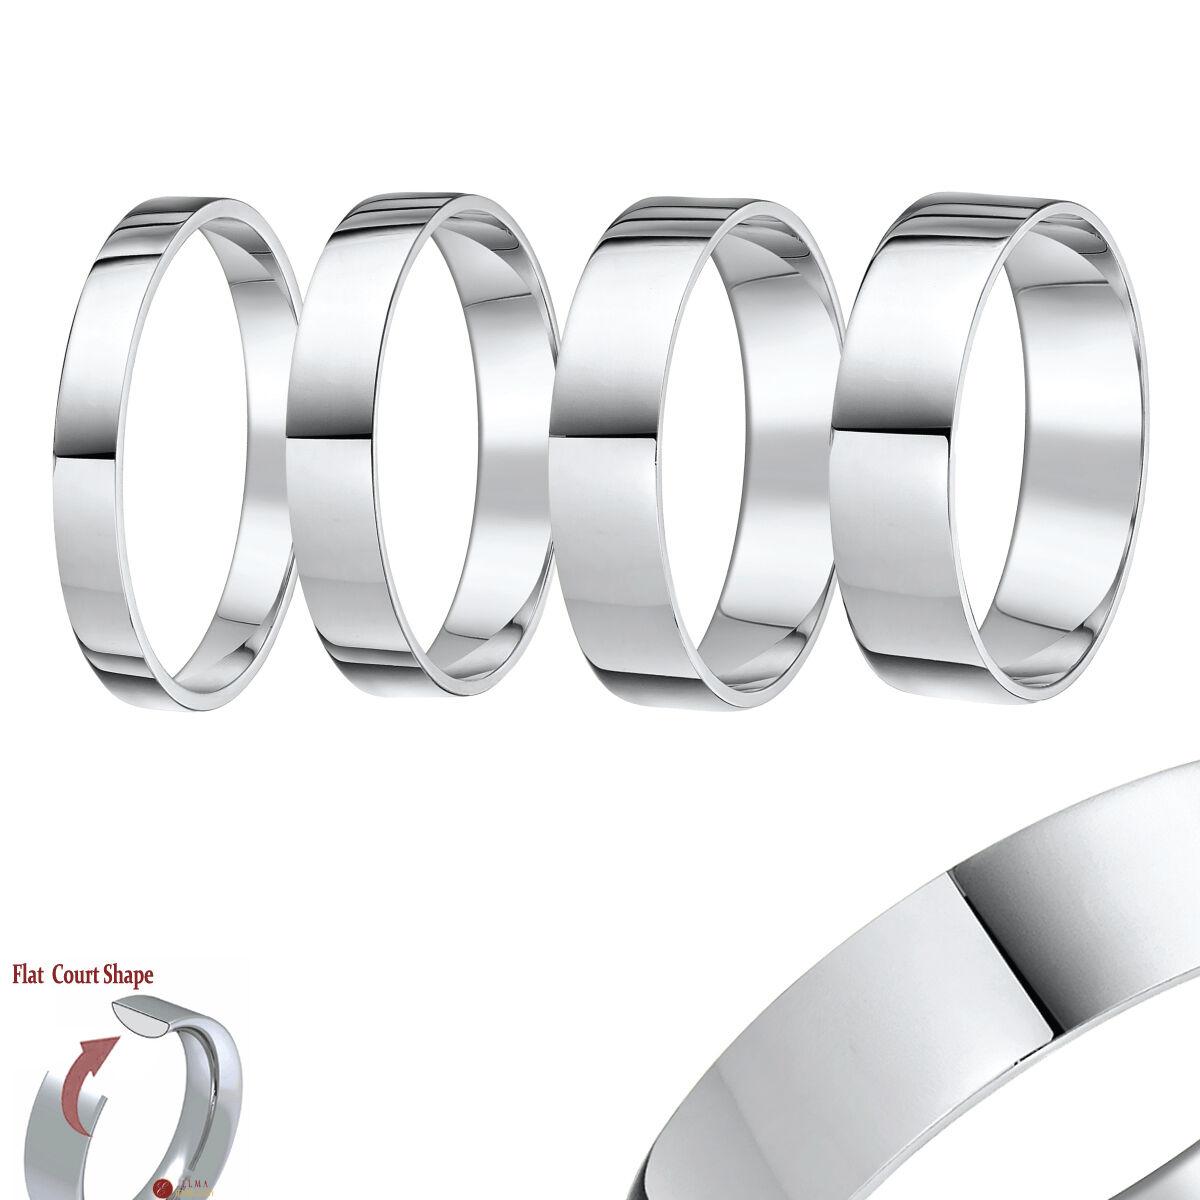 18 Karat Weiss gold Hochzeit Ring Flachgericht Form Solide Punziert 750 Ehering